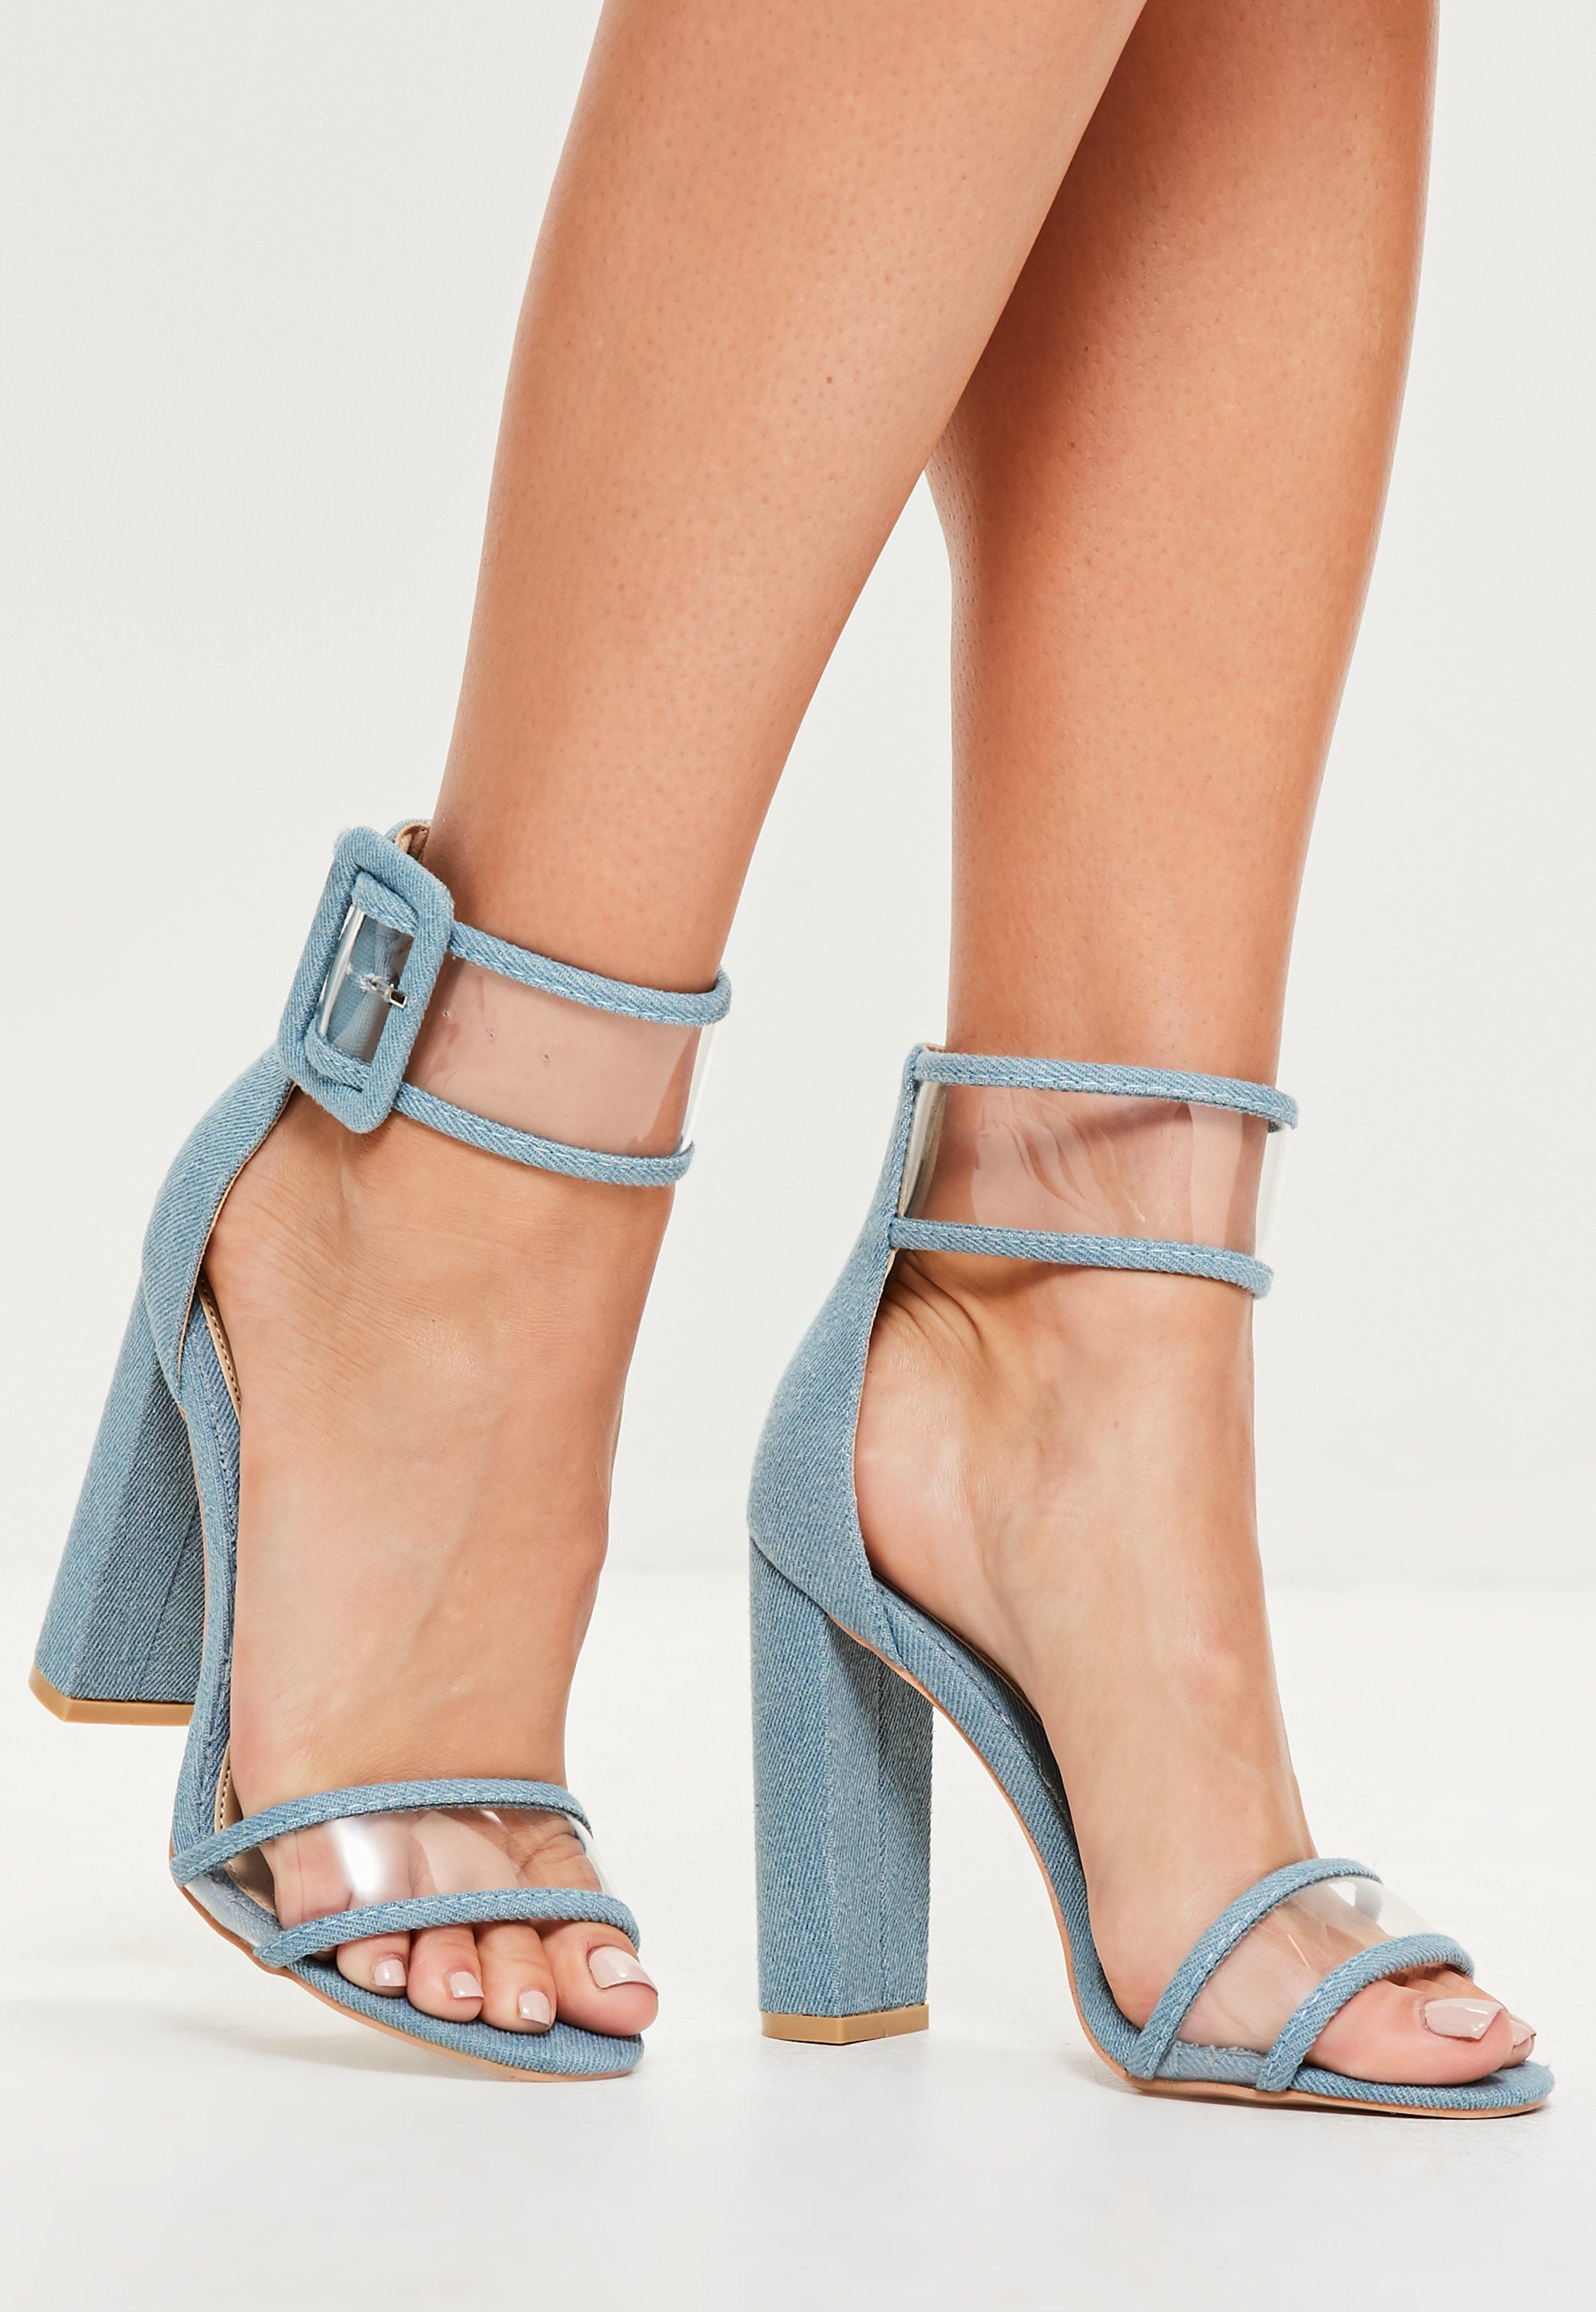 60b2625c4 Lyst - Missguided Blue Denim Clear Ankle Strap Block Heels in Blue